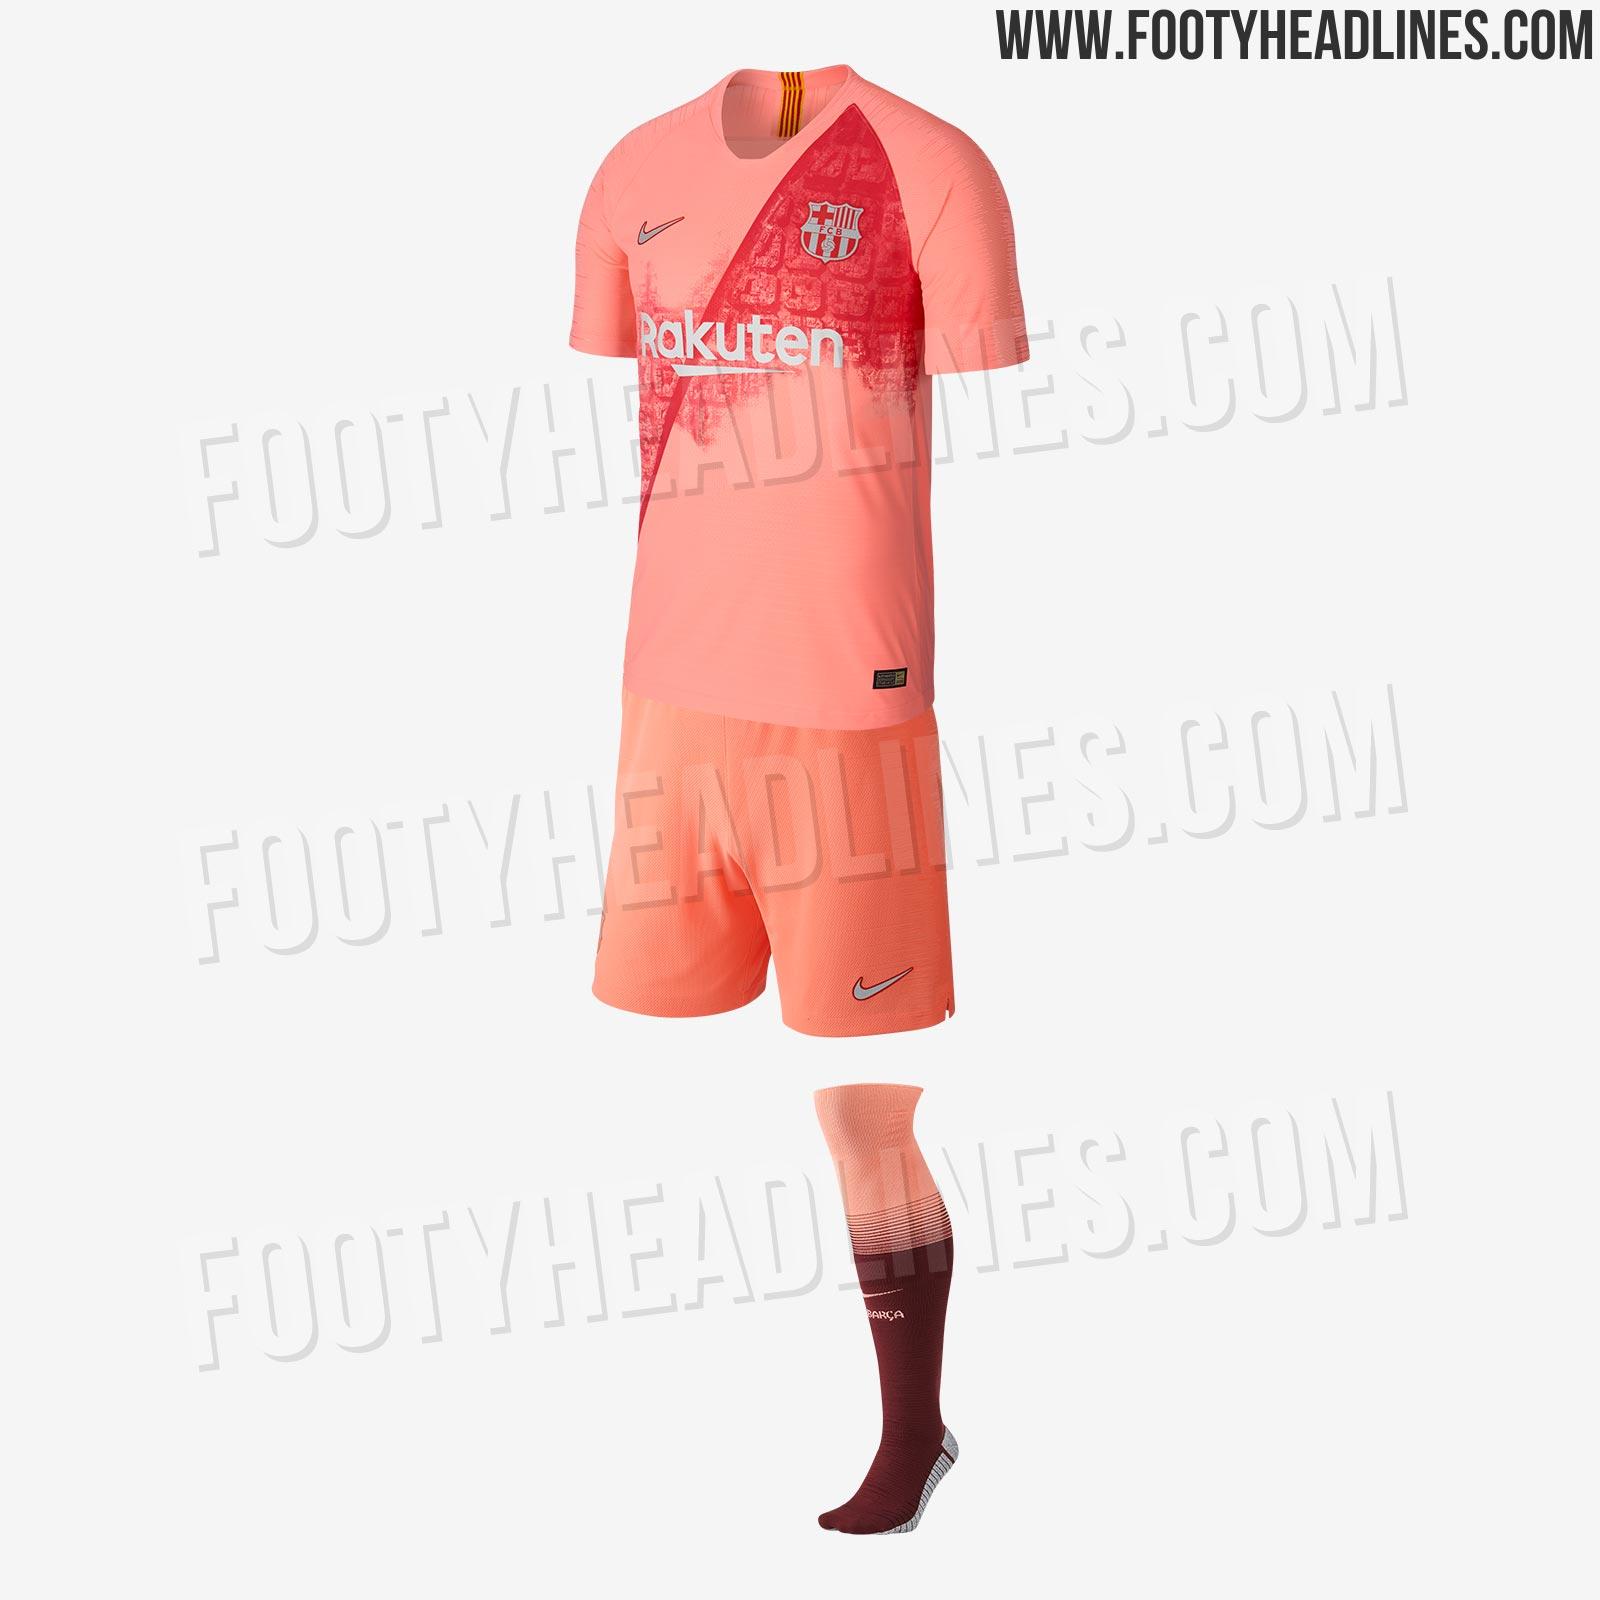 d18a427e9 Nike FC Barcelona 18-19 Third Kit Released - Footy Headlines